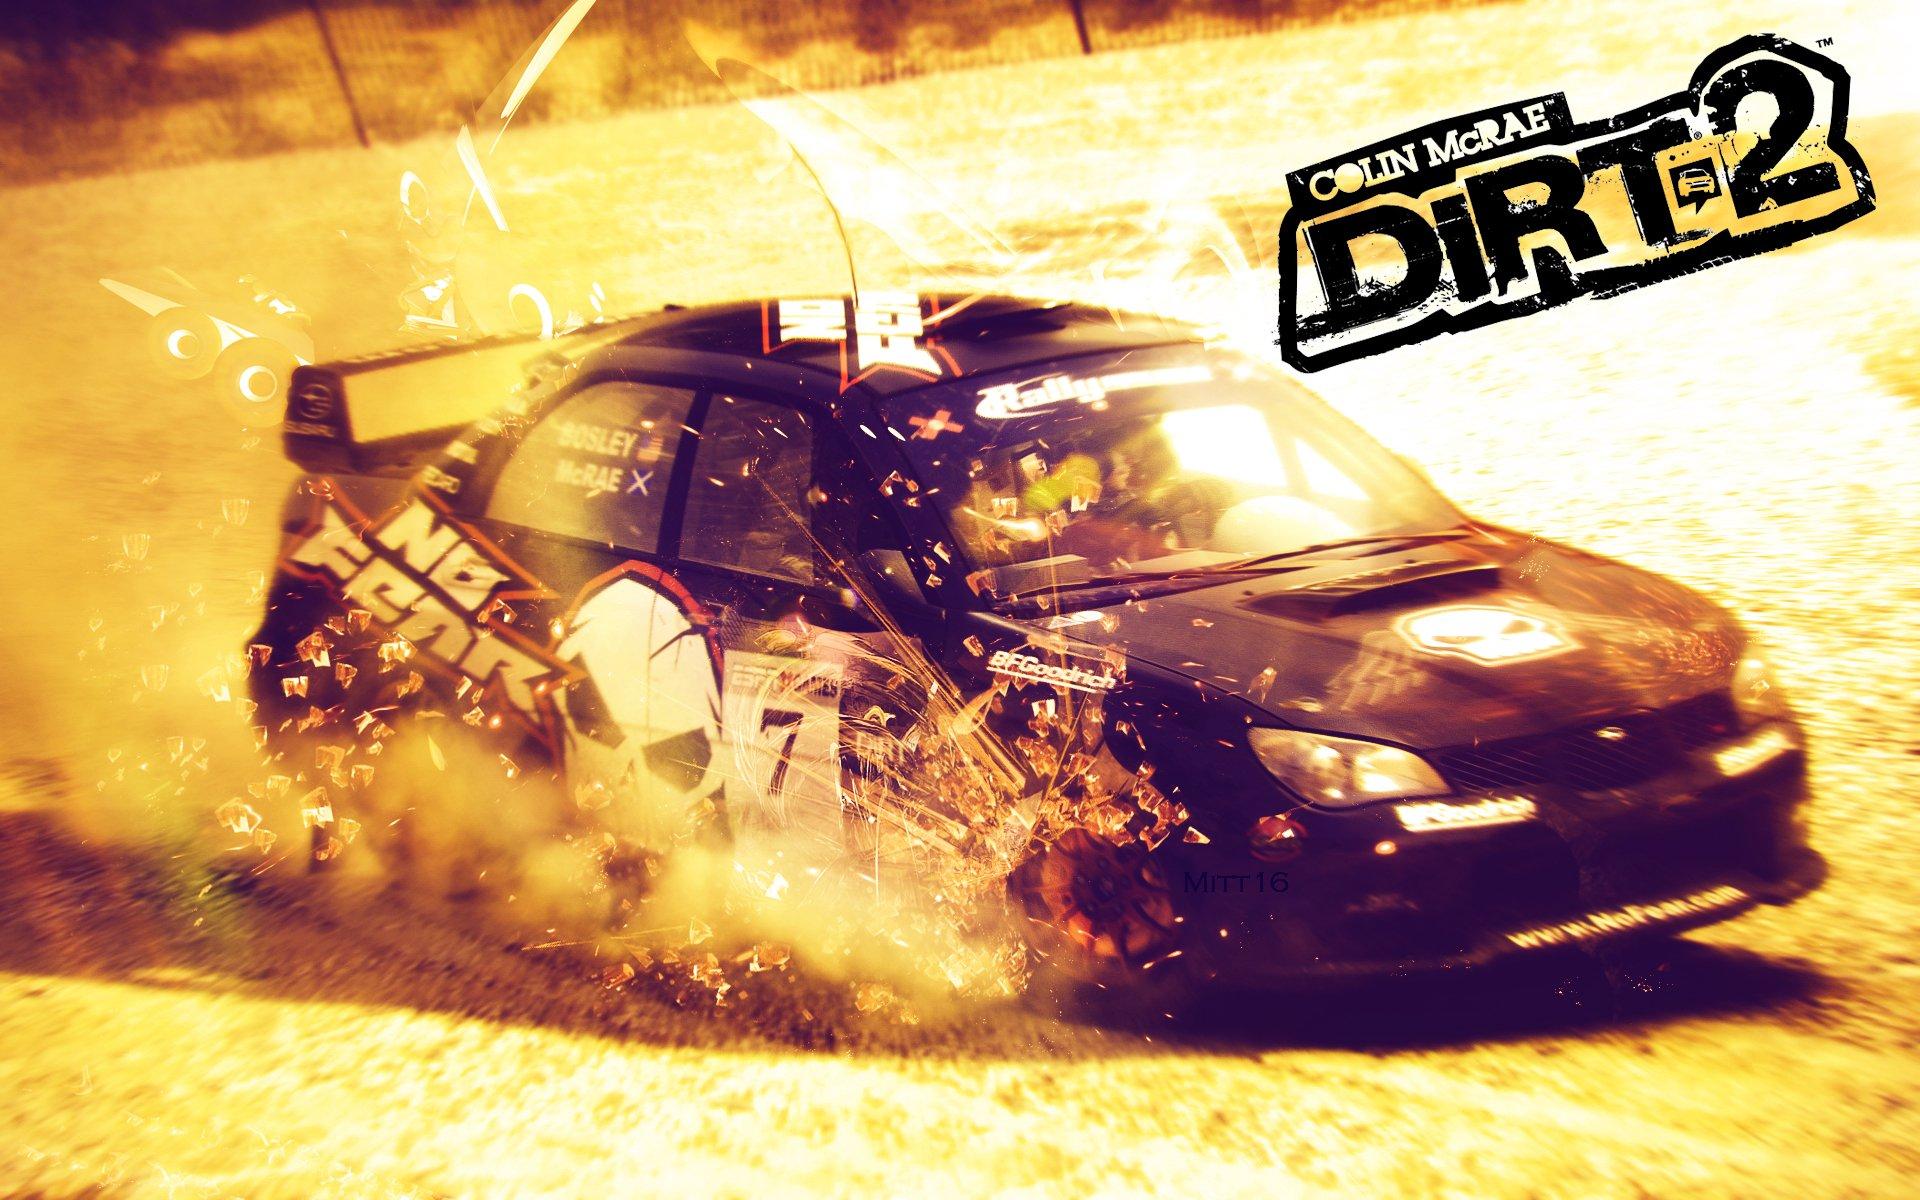 Colin McRae Dirt 2 review